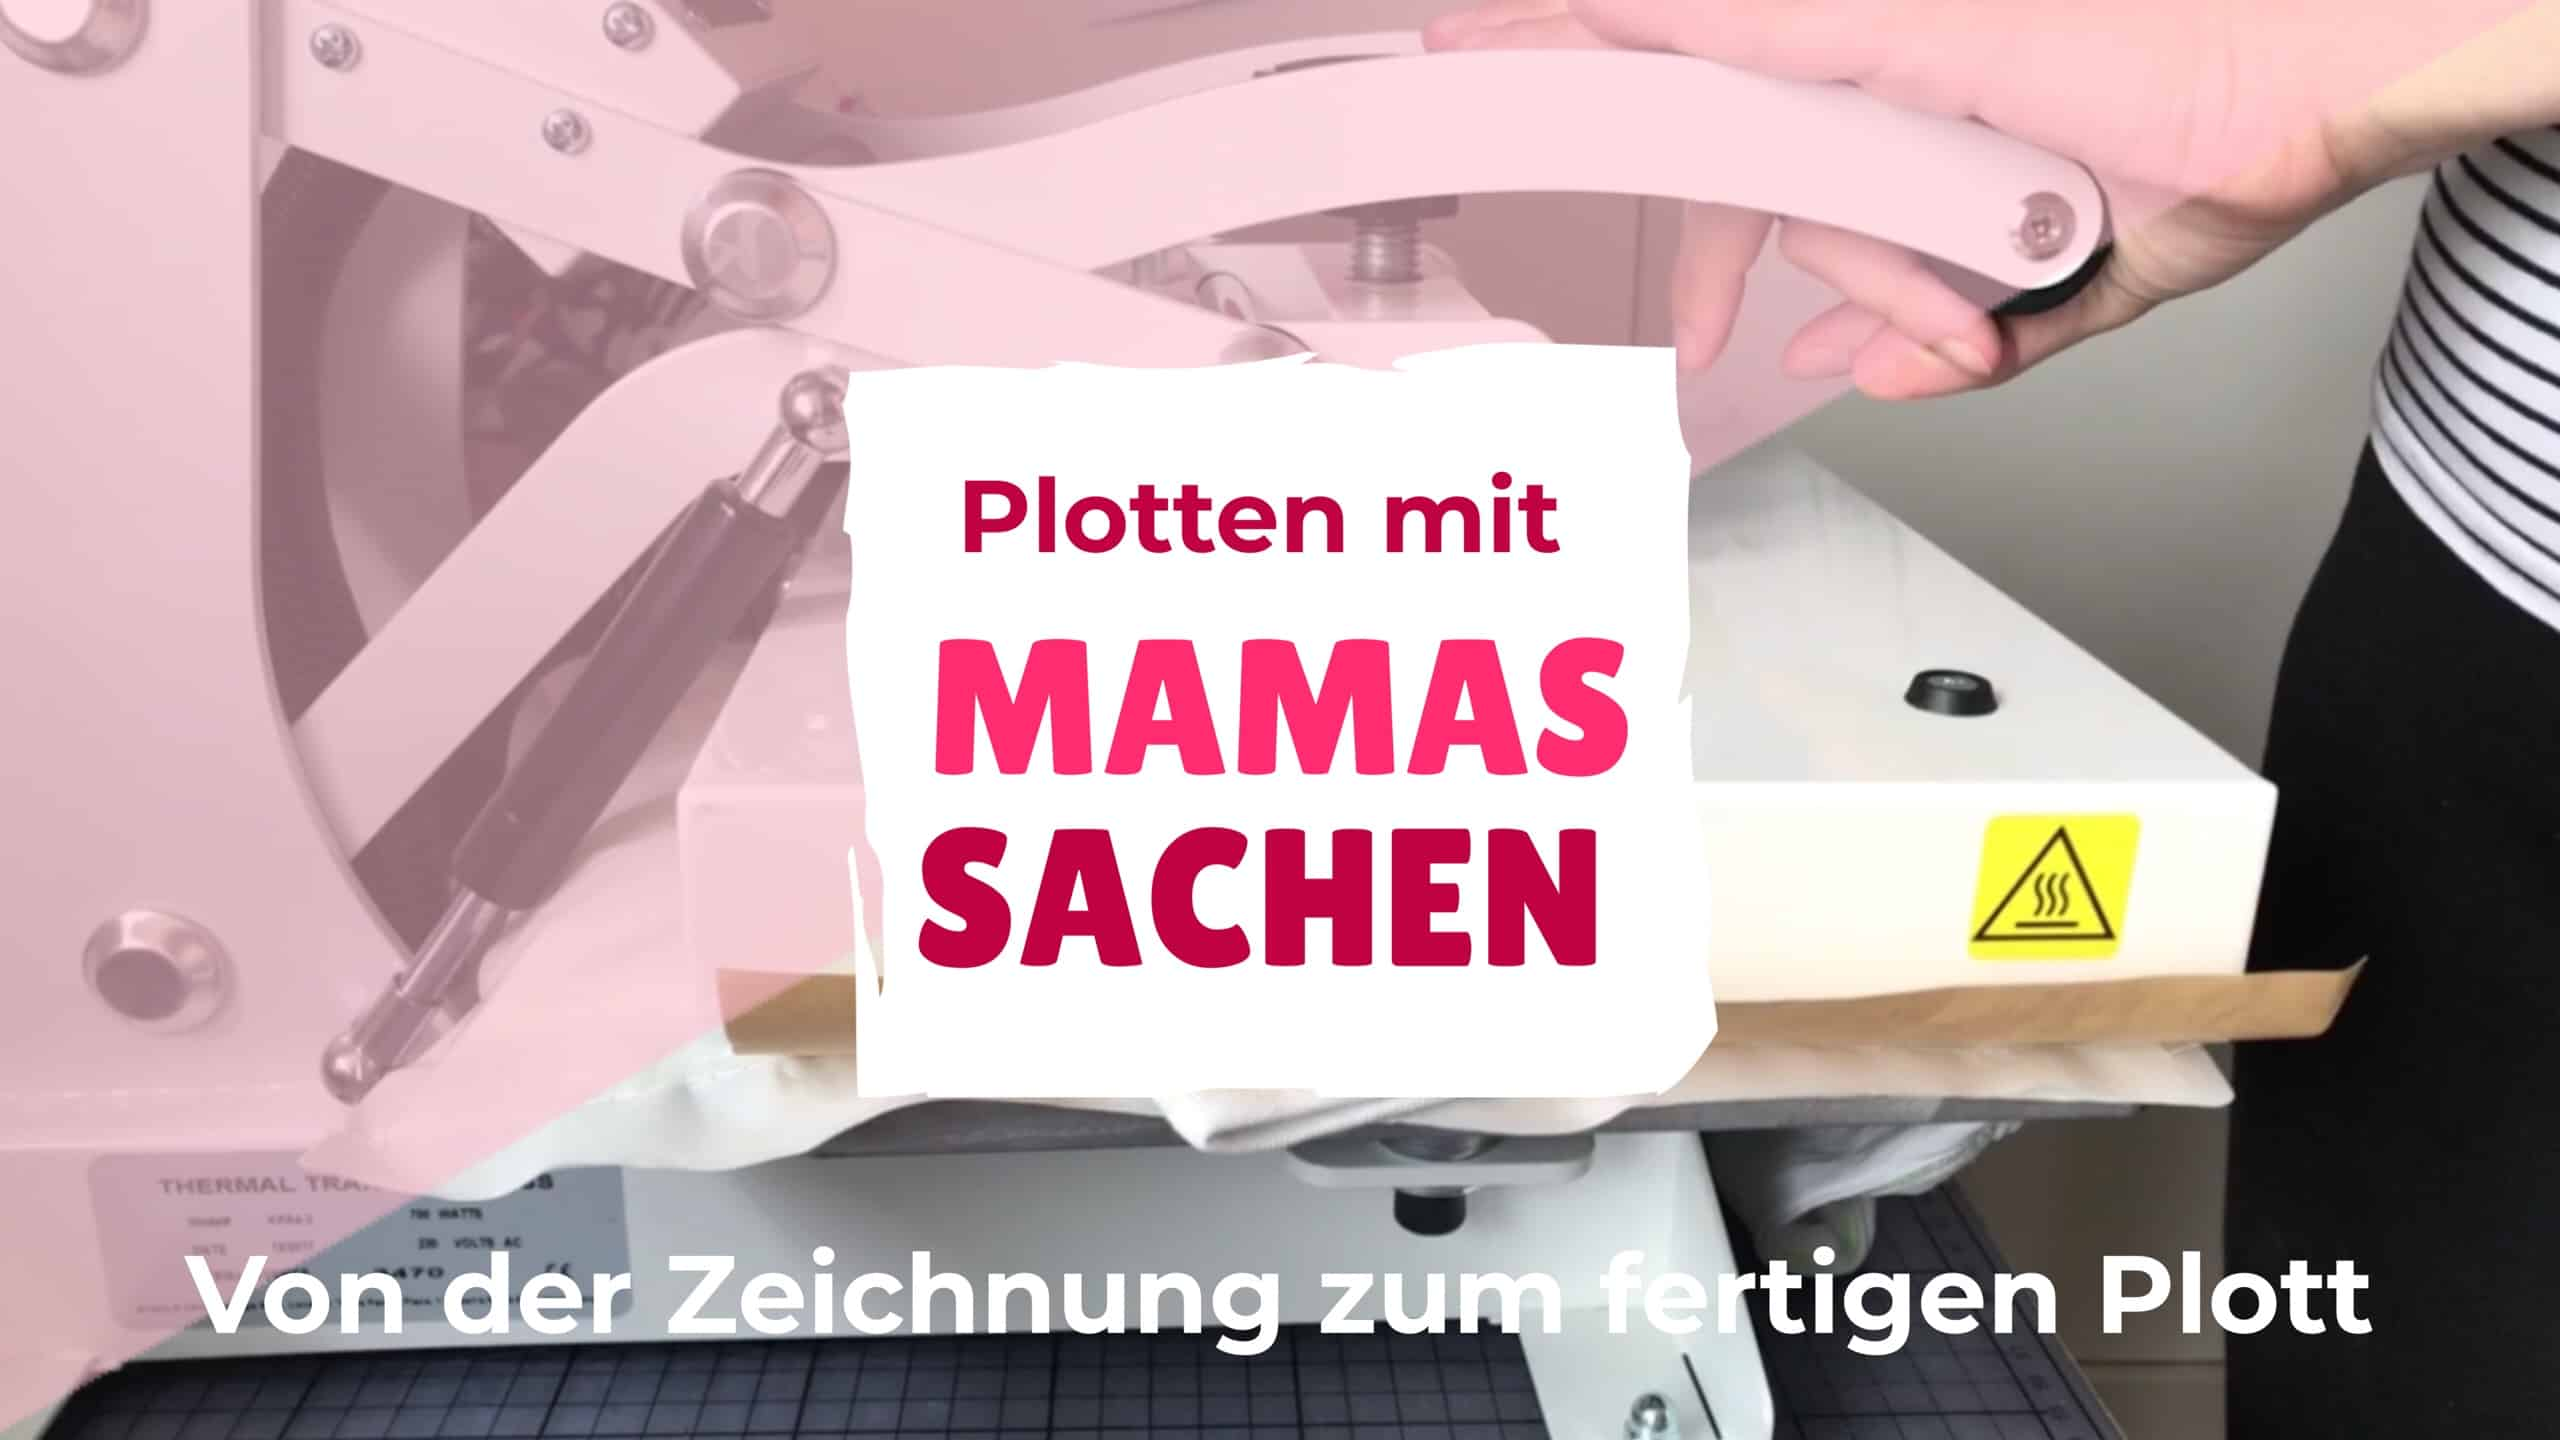 Wie entsteht eine Plotterdatei? Plotten mit Mamas Sachen, Plottbasics, Freebie, Plotterdatei, Materialien, Tipps